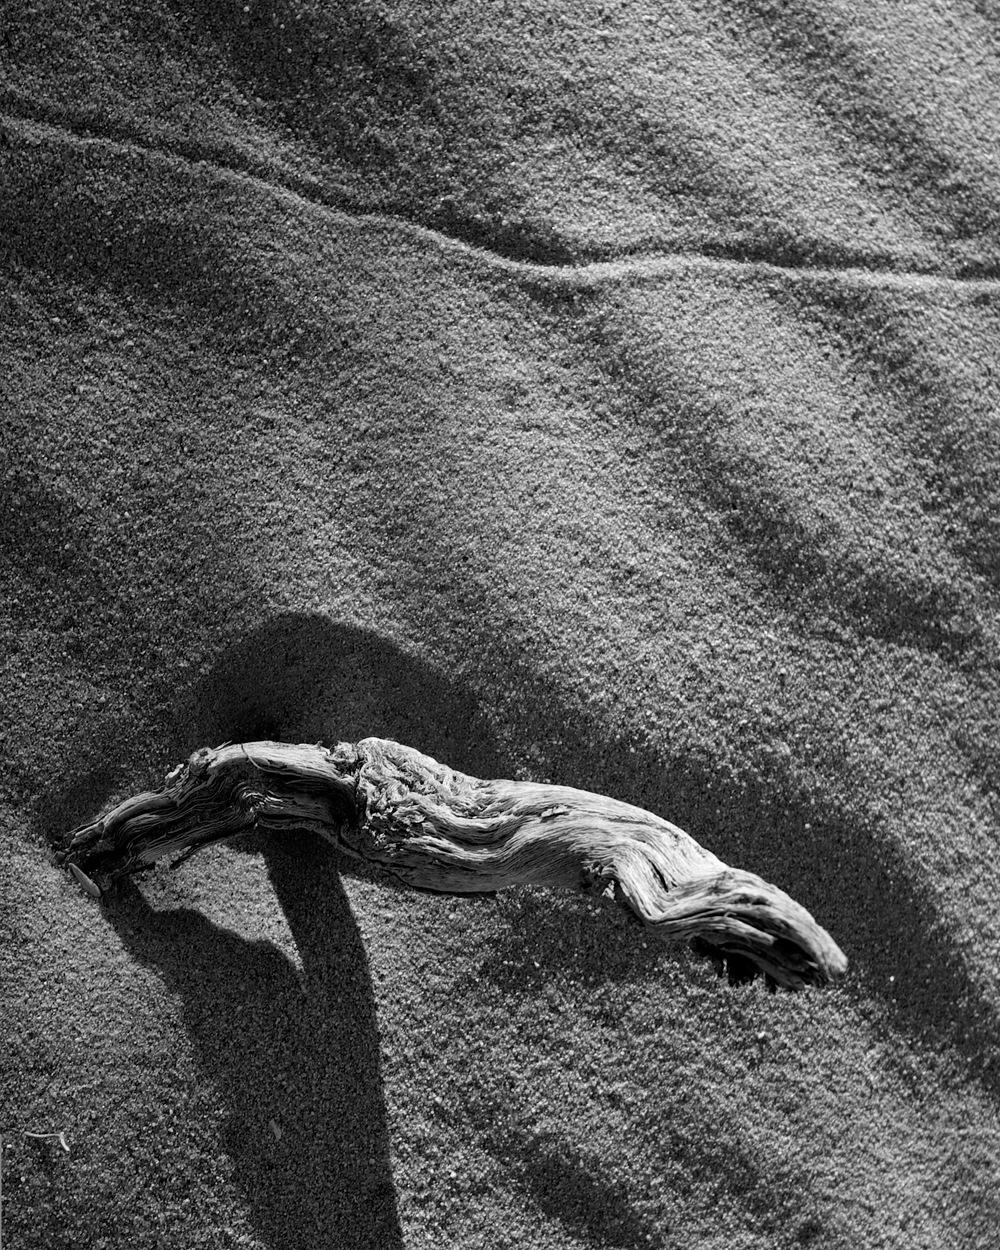 2012_10_14 | Borrego Dunes_2012-10-14_17-48-35_IMG_2762_©ArieKorporaal2012 copy.jpg